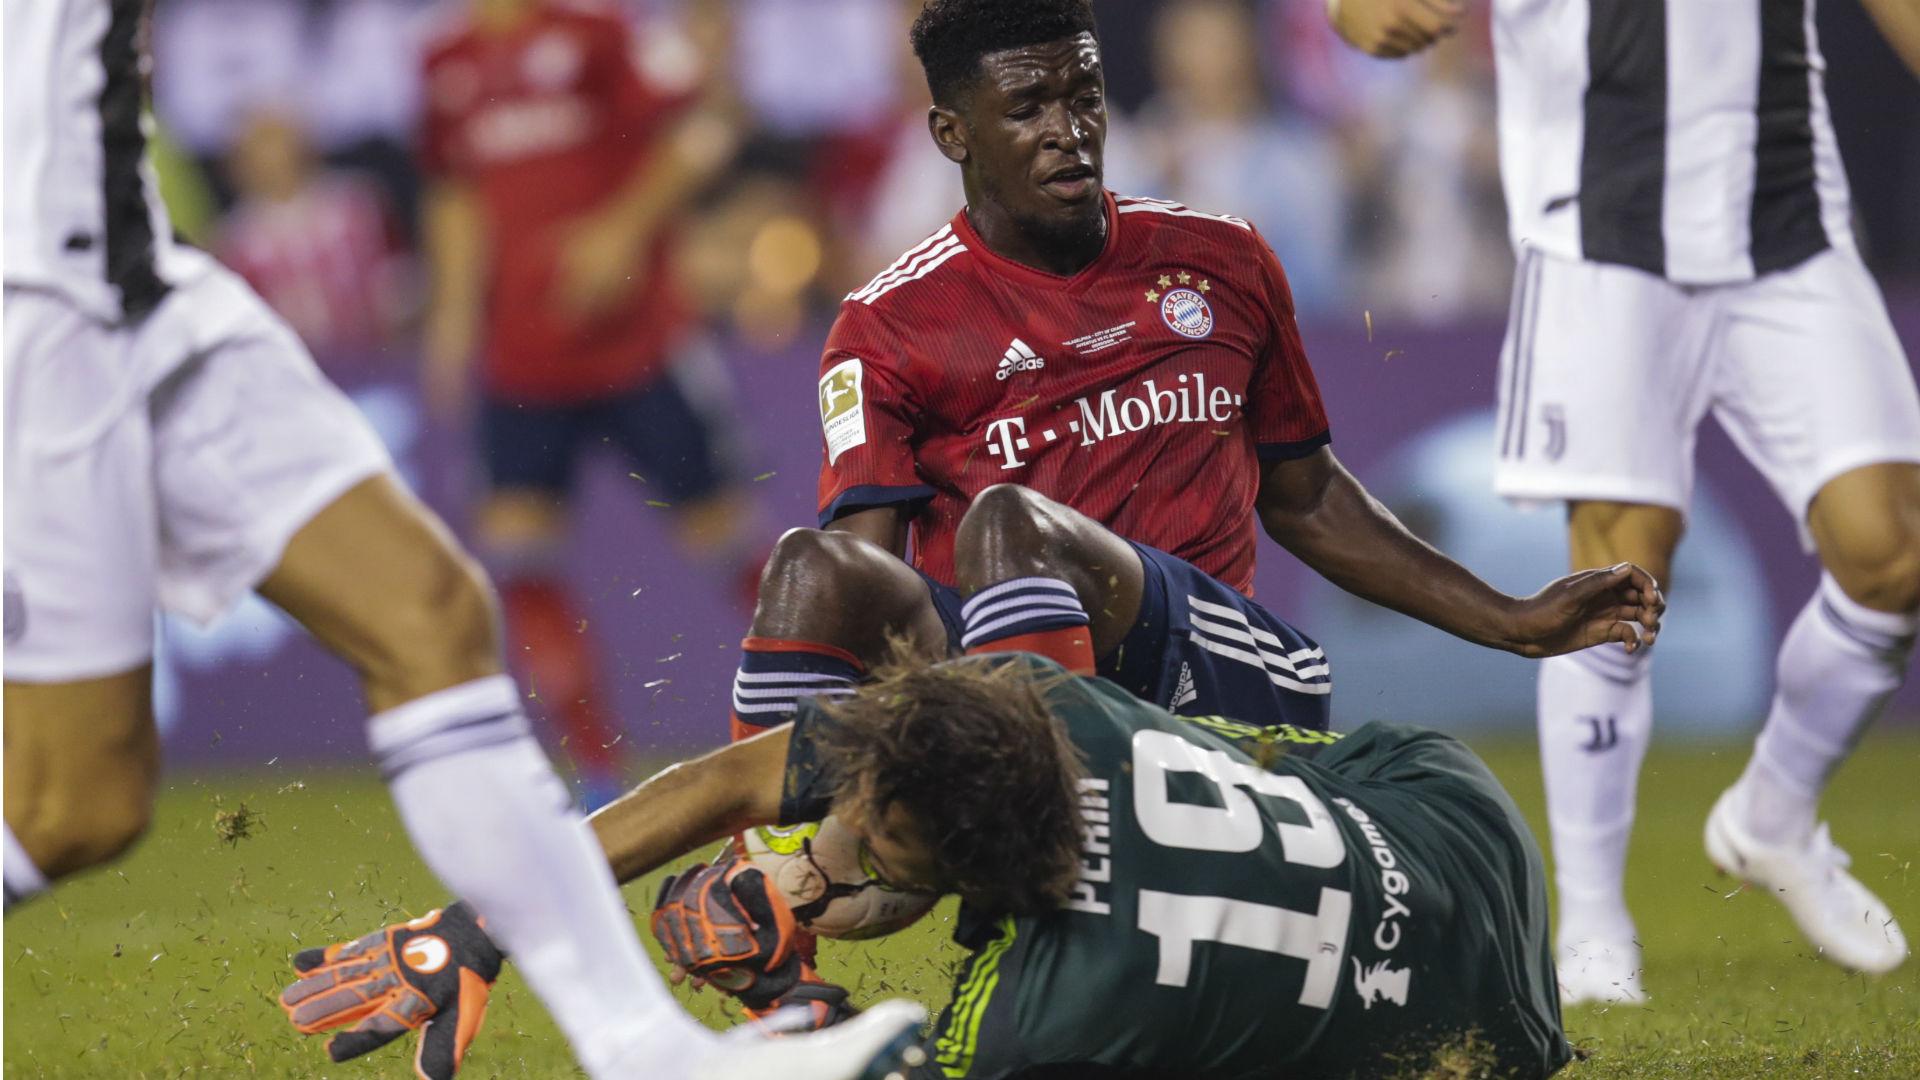 ICC 2018: dove vedere Juventus-Bayern Monaco in tv e streaming